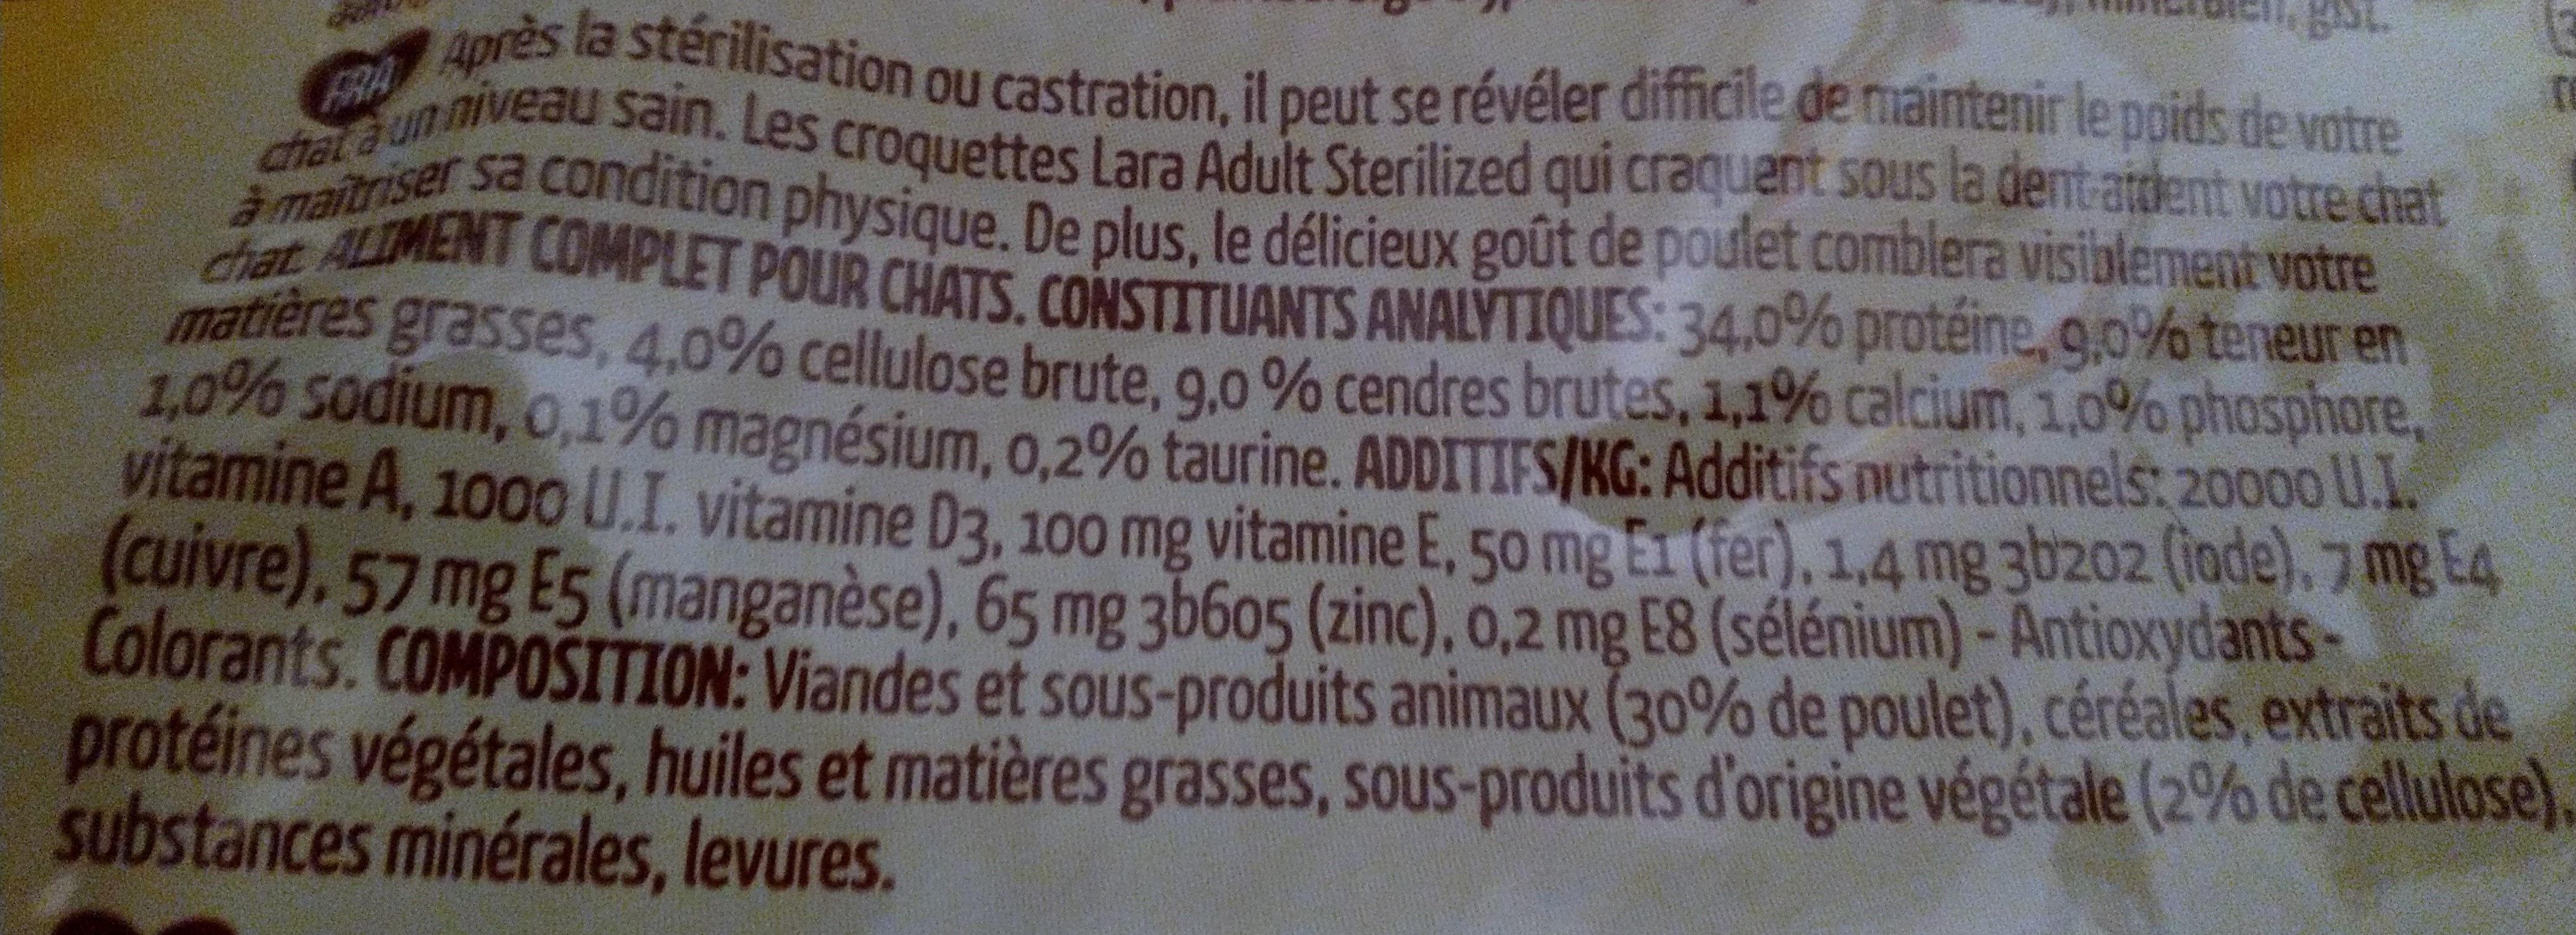 Lara adult sterilized - Ingredients - en